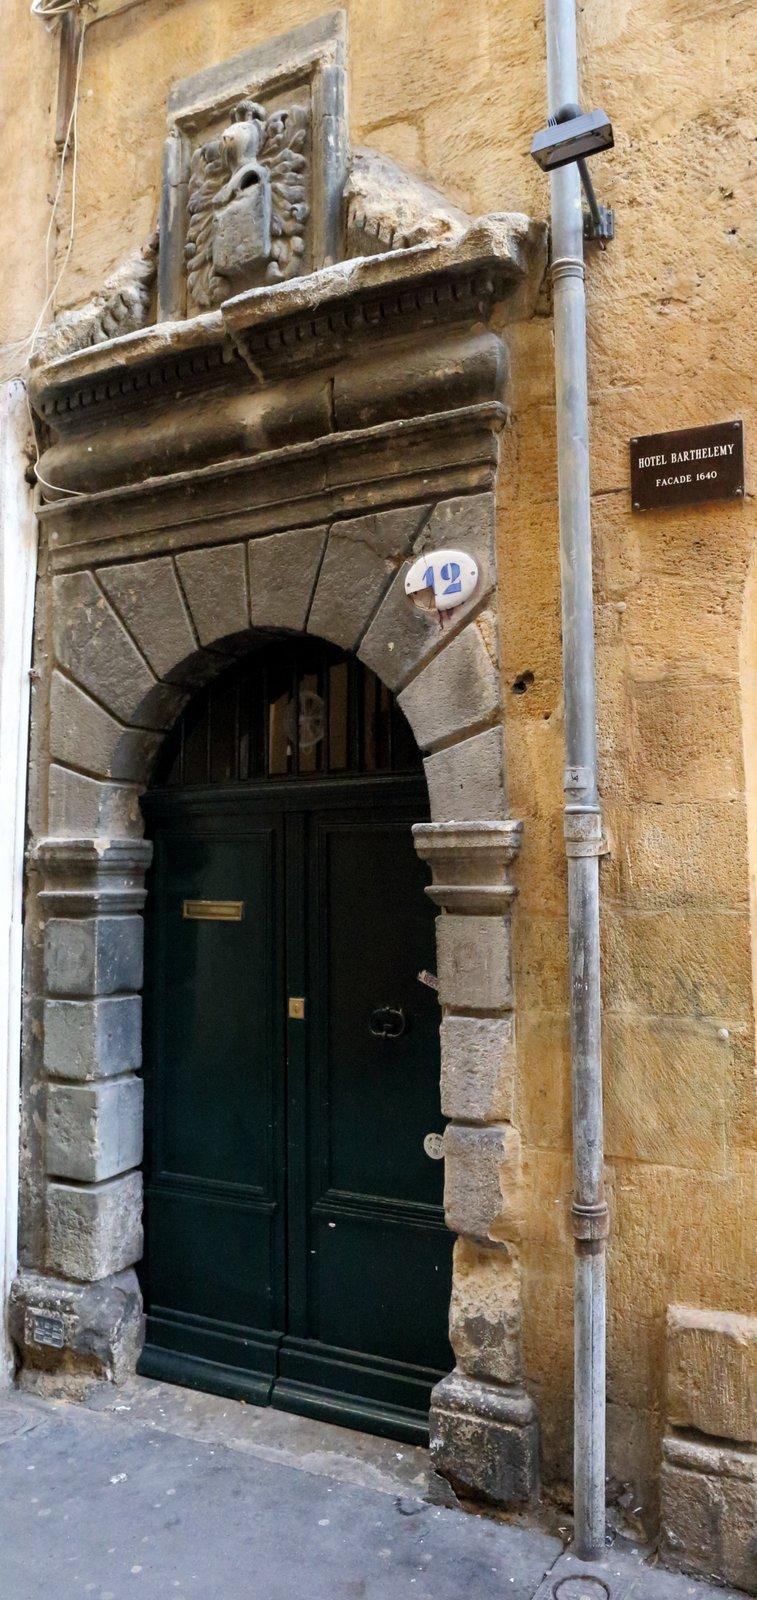 Hôtel de Barthélemy